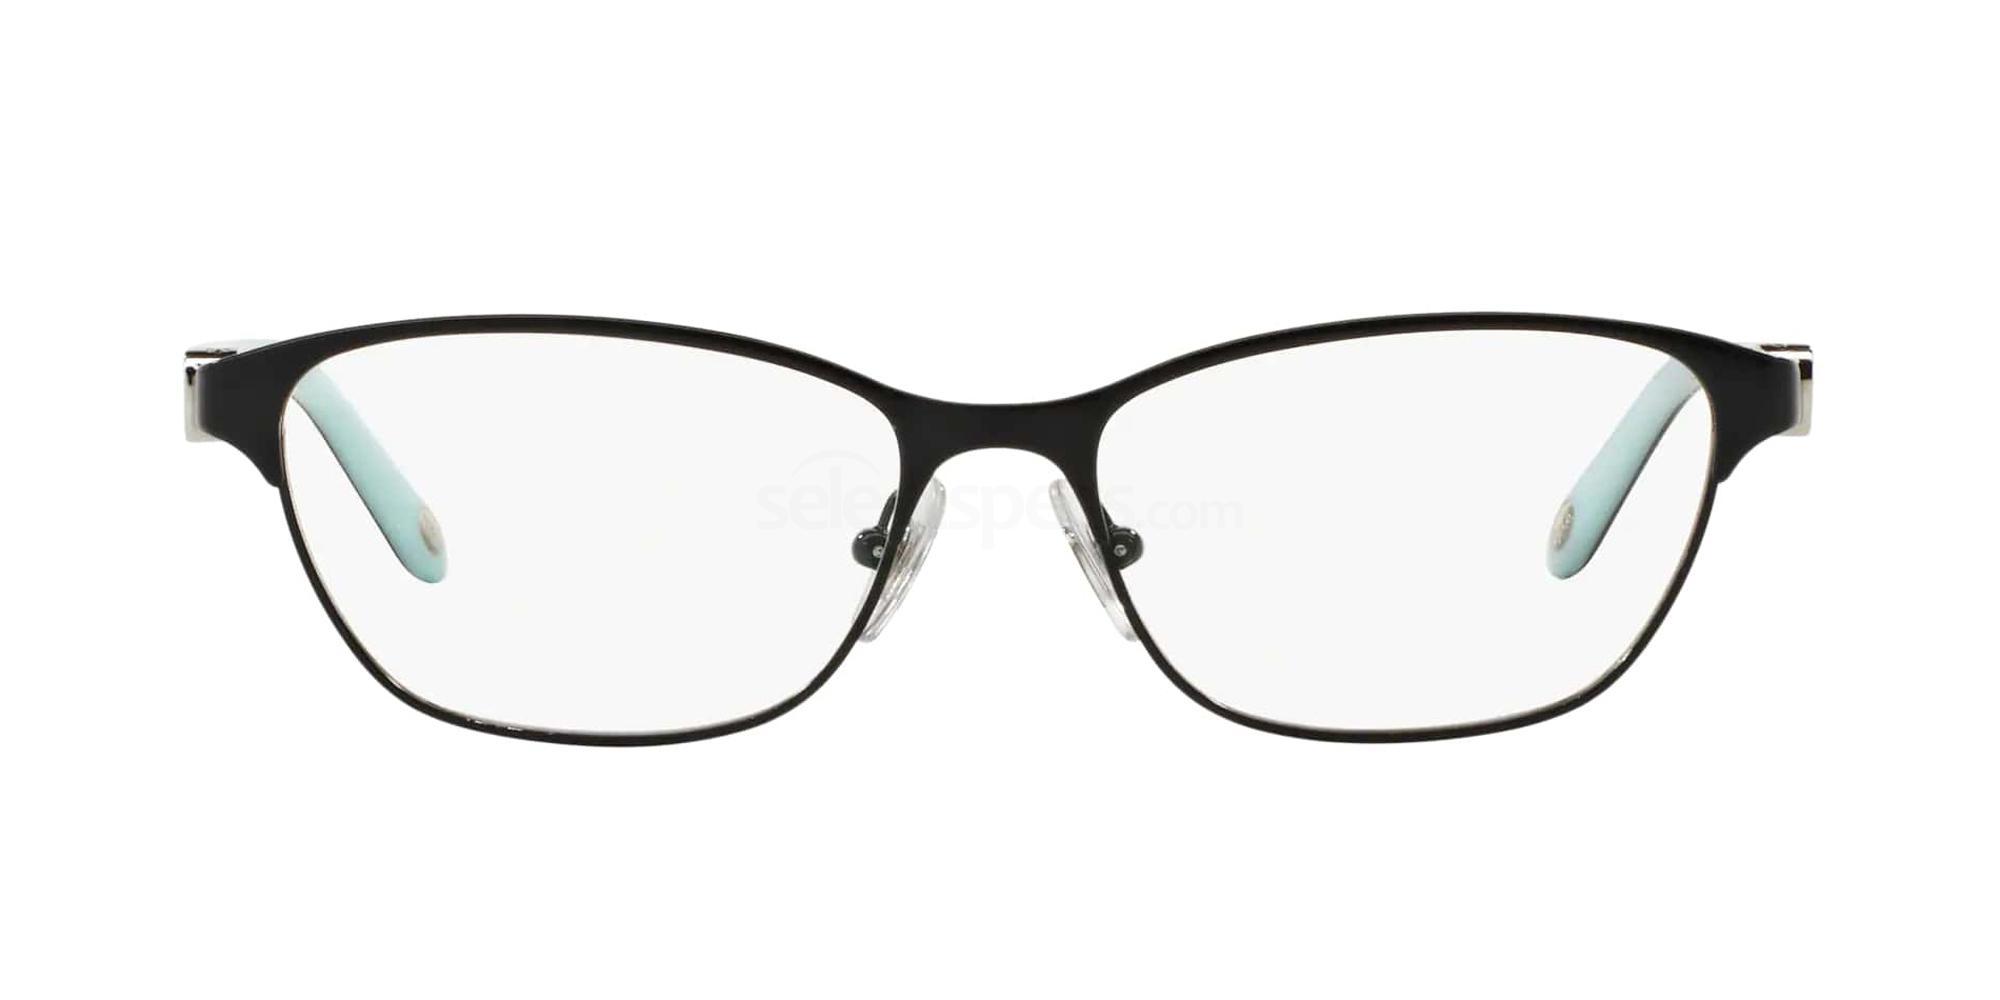 6007 TF1072 Glasses, Tiffany & Co.